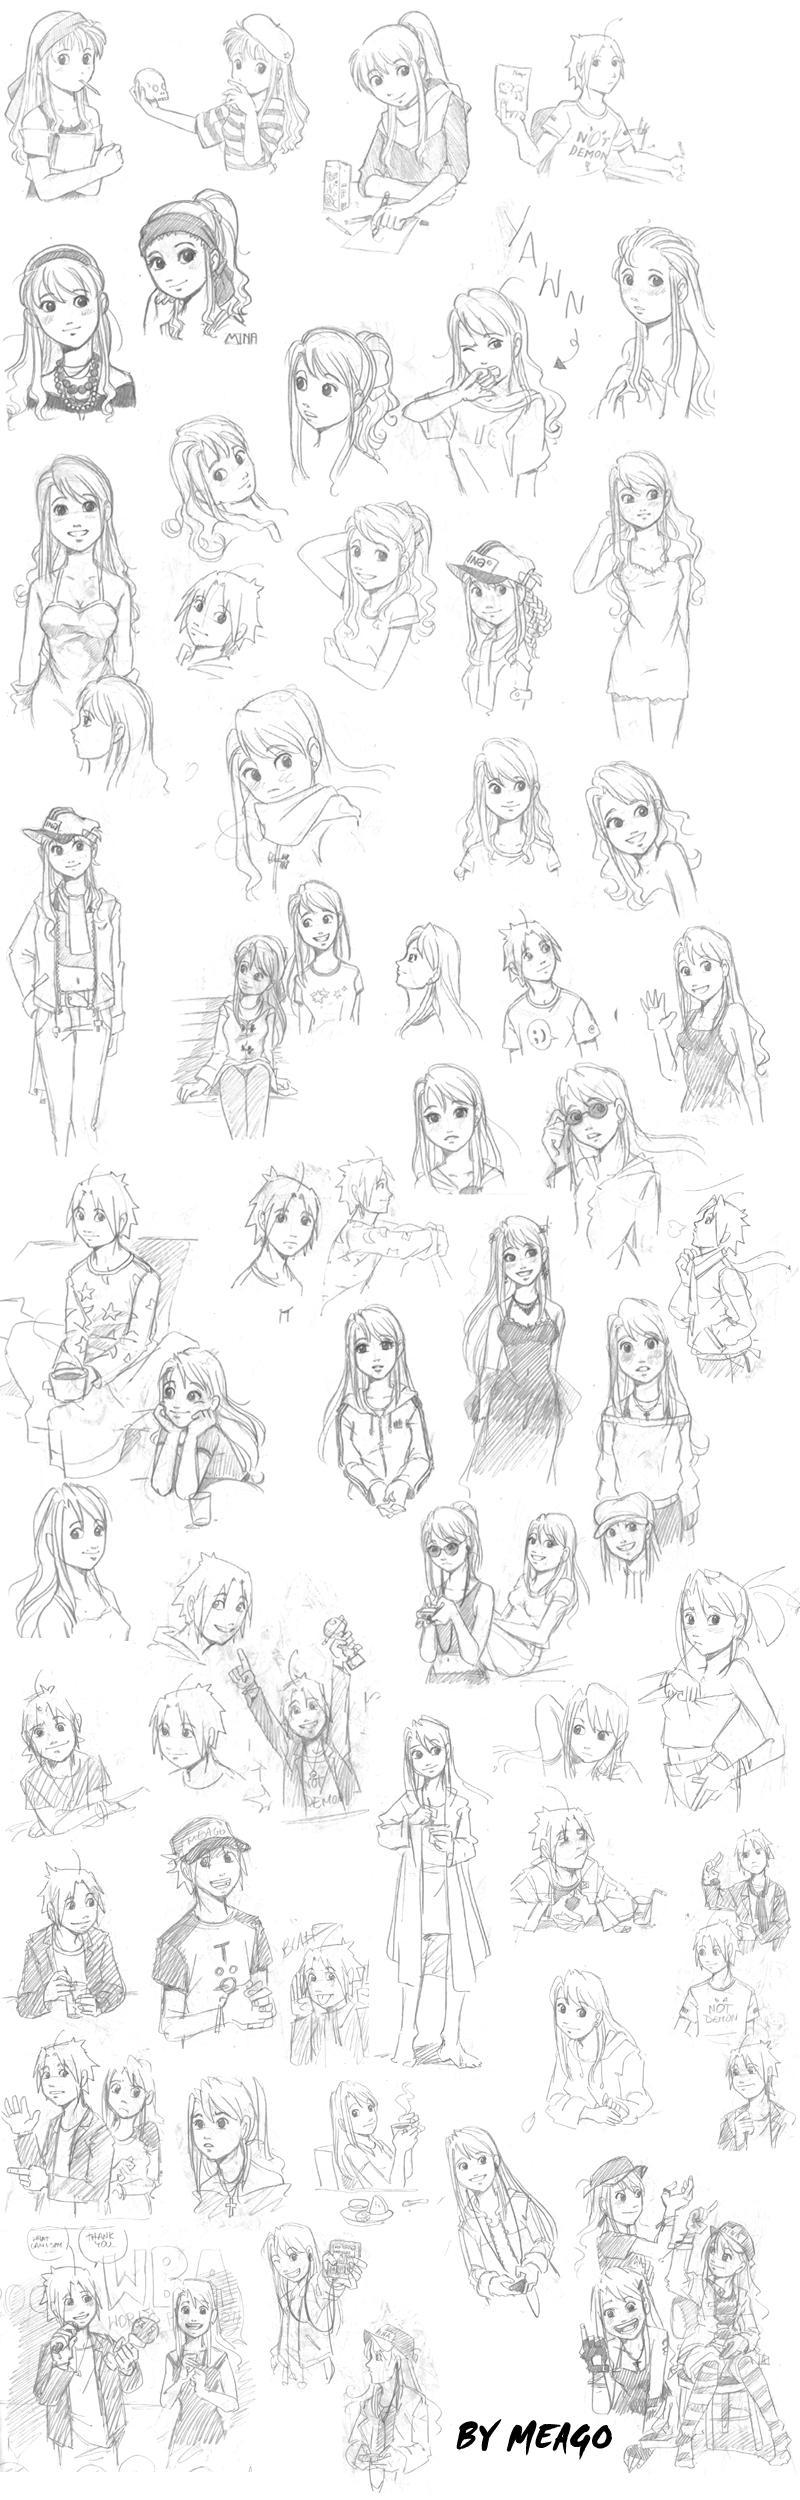 Meago Saga random sketches by meago